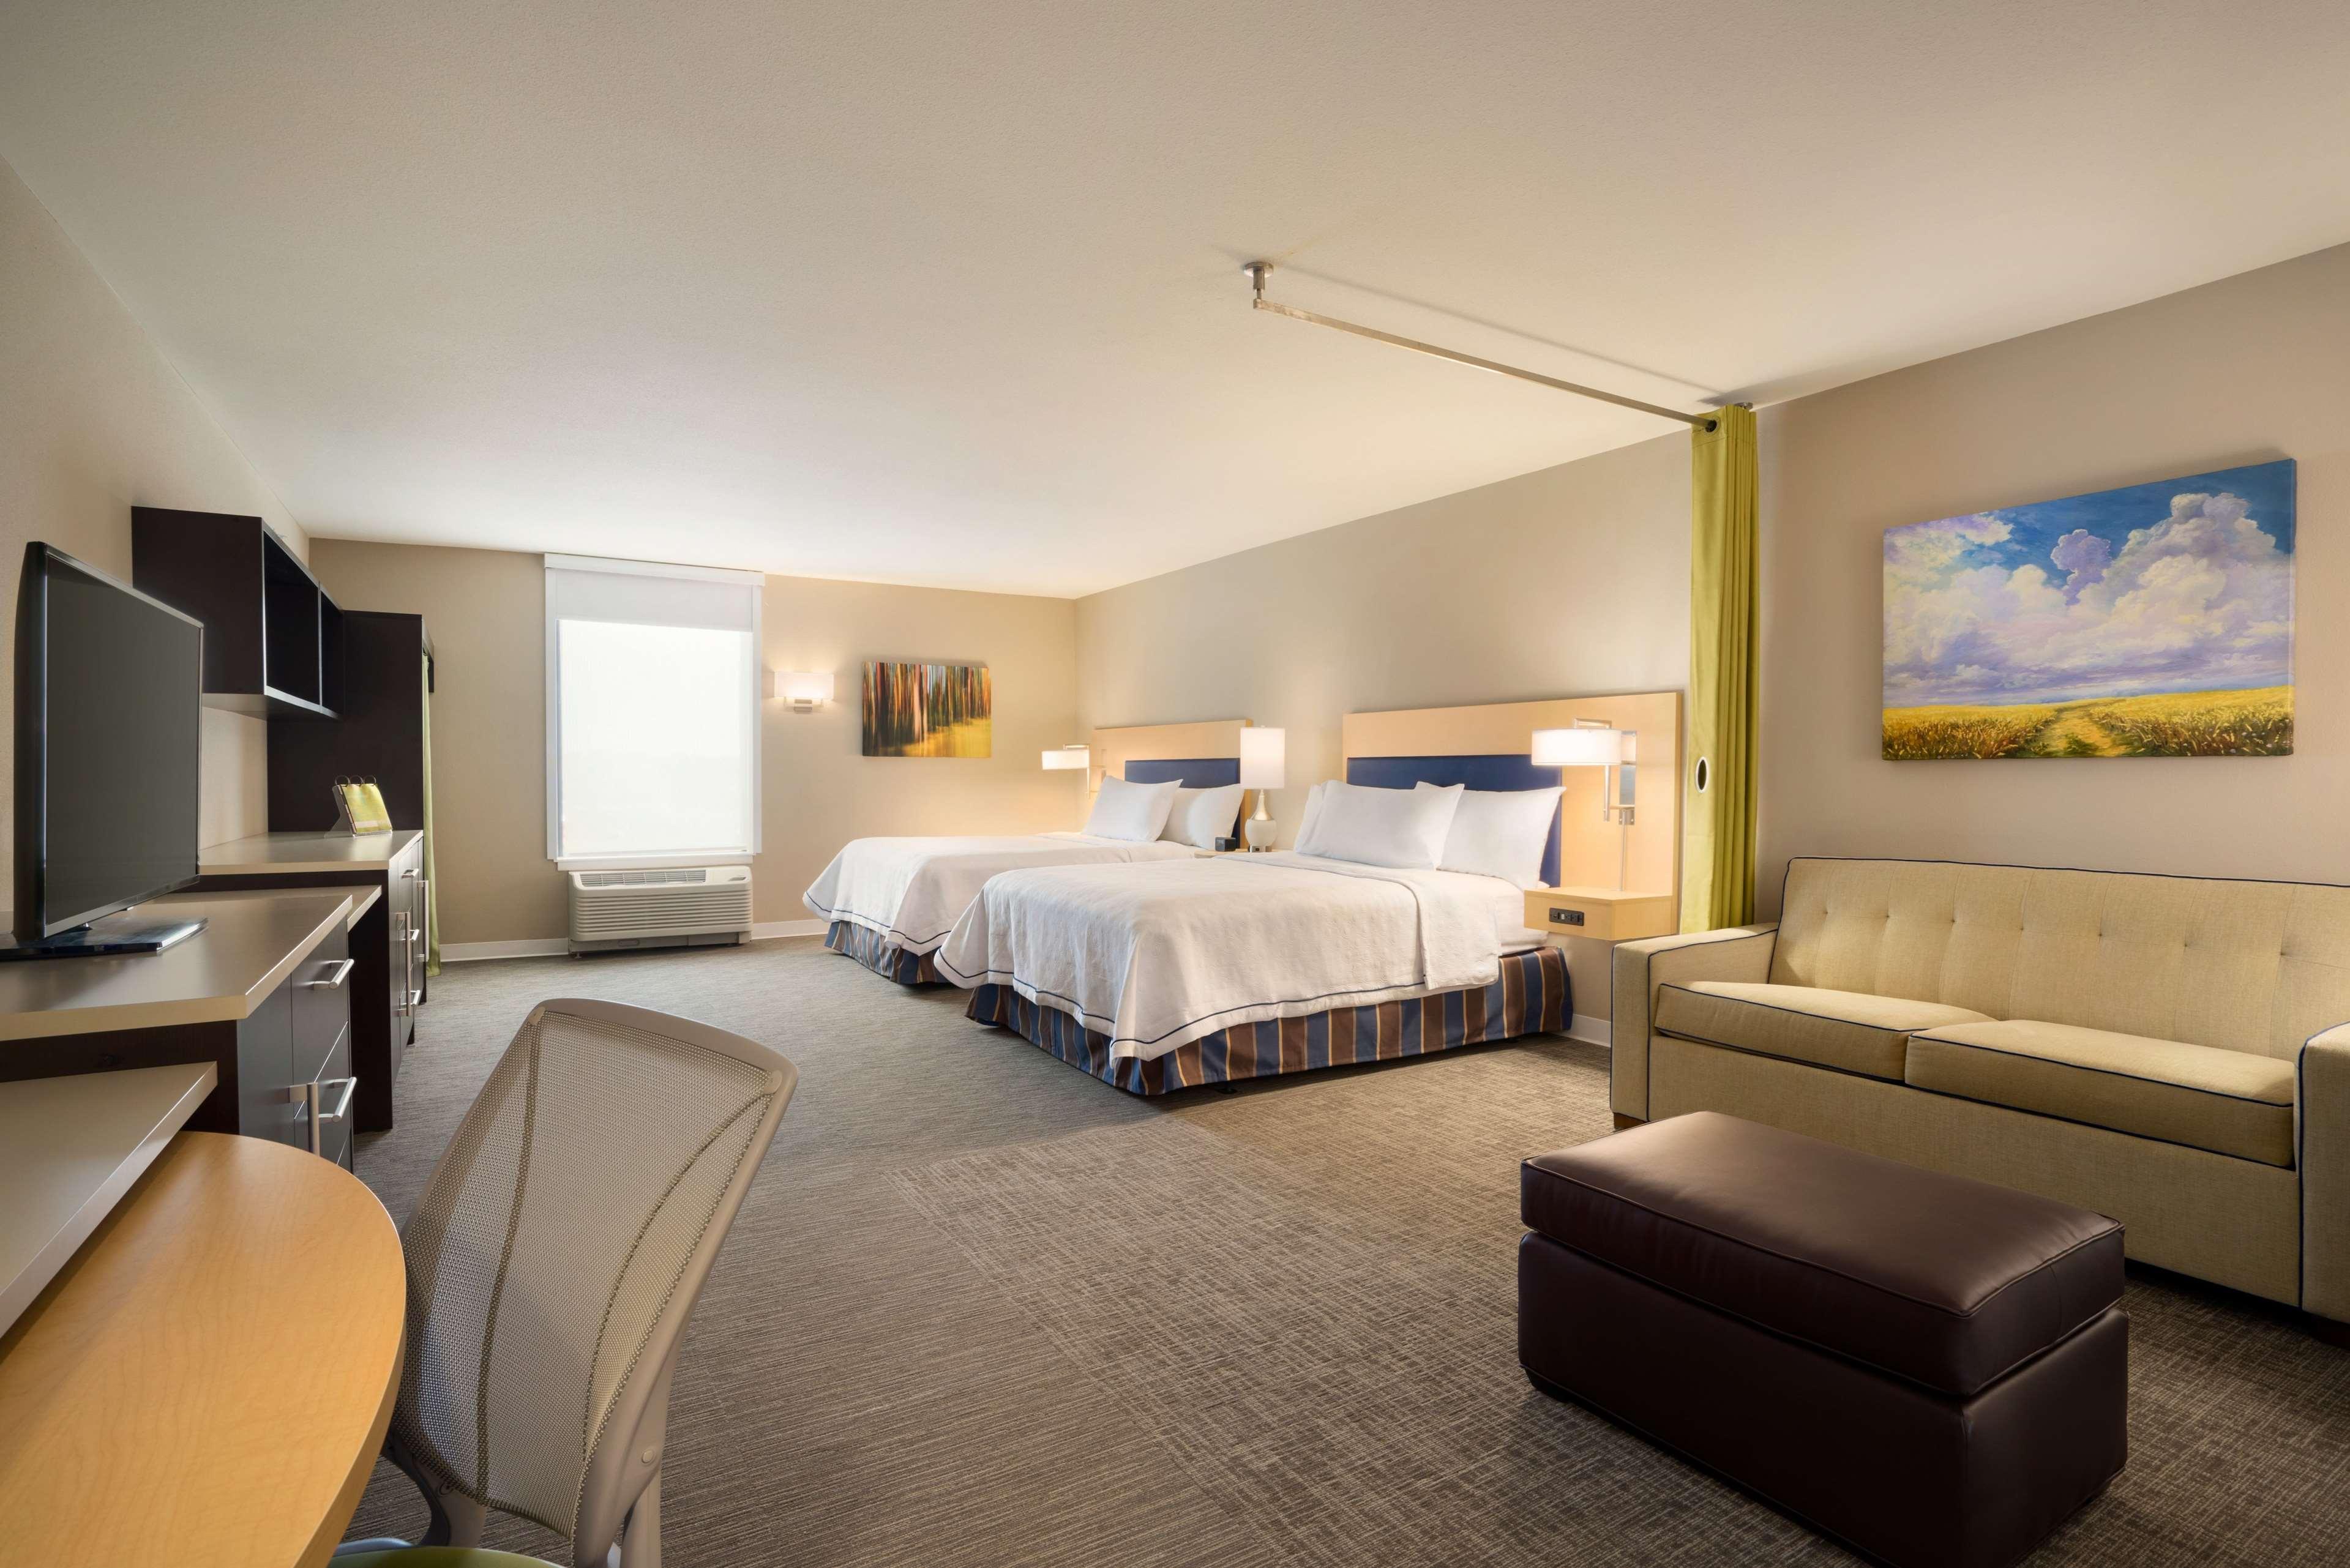 Home2 Suites by Hilton Leavenworth Downtown image 22